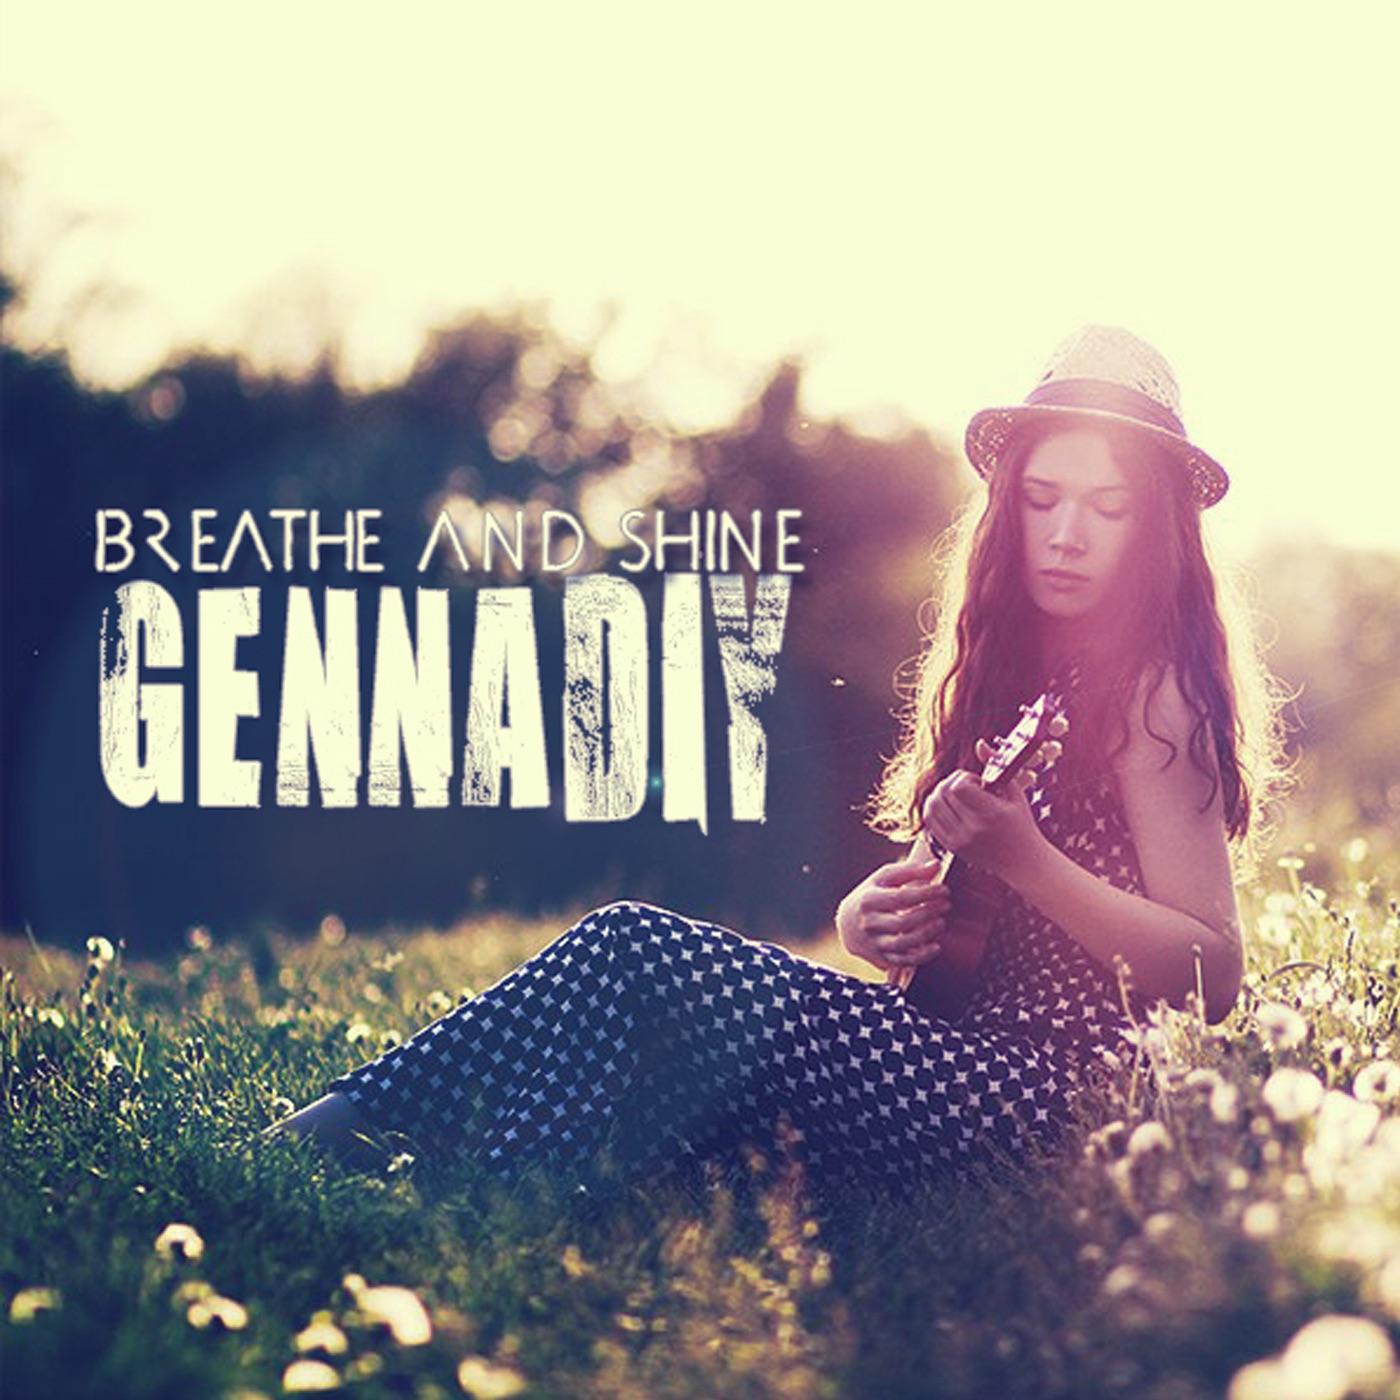 Breathe and Shine